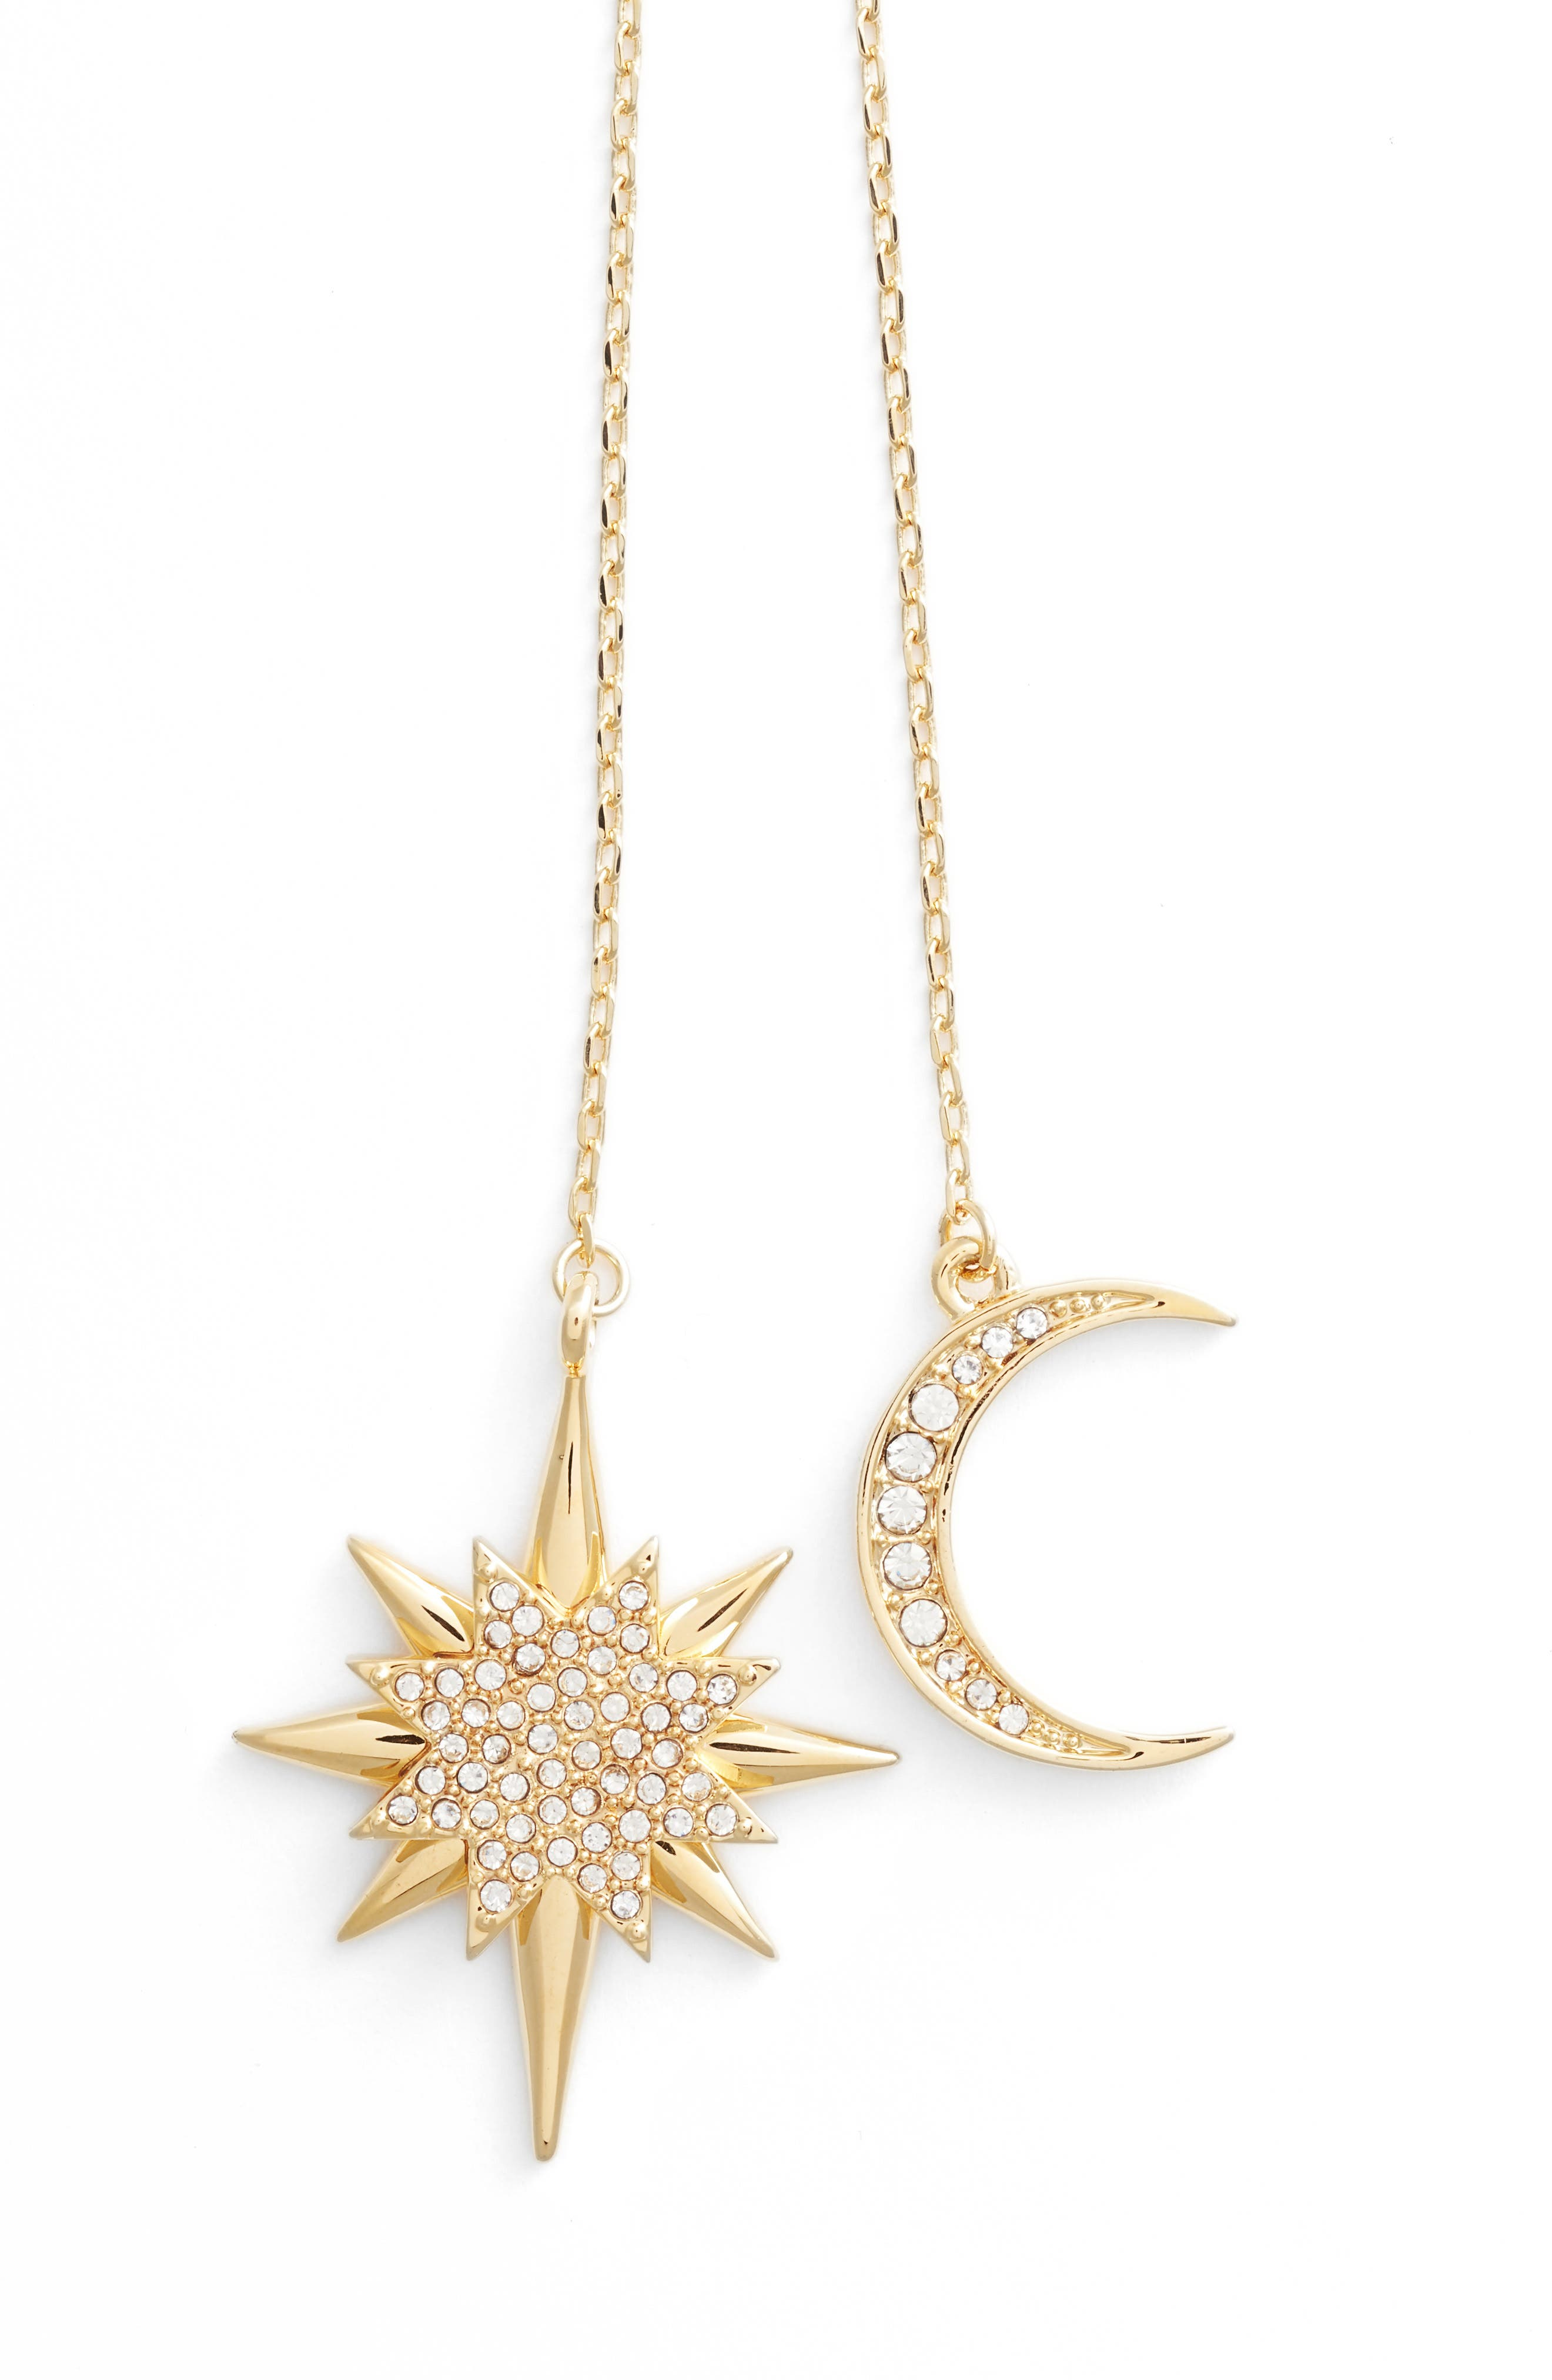 Celestial Skies Slider Pendant Necklace,                             Alternate thumbnail 2, color,                             Gold